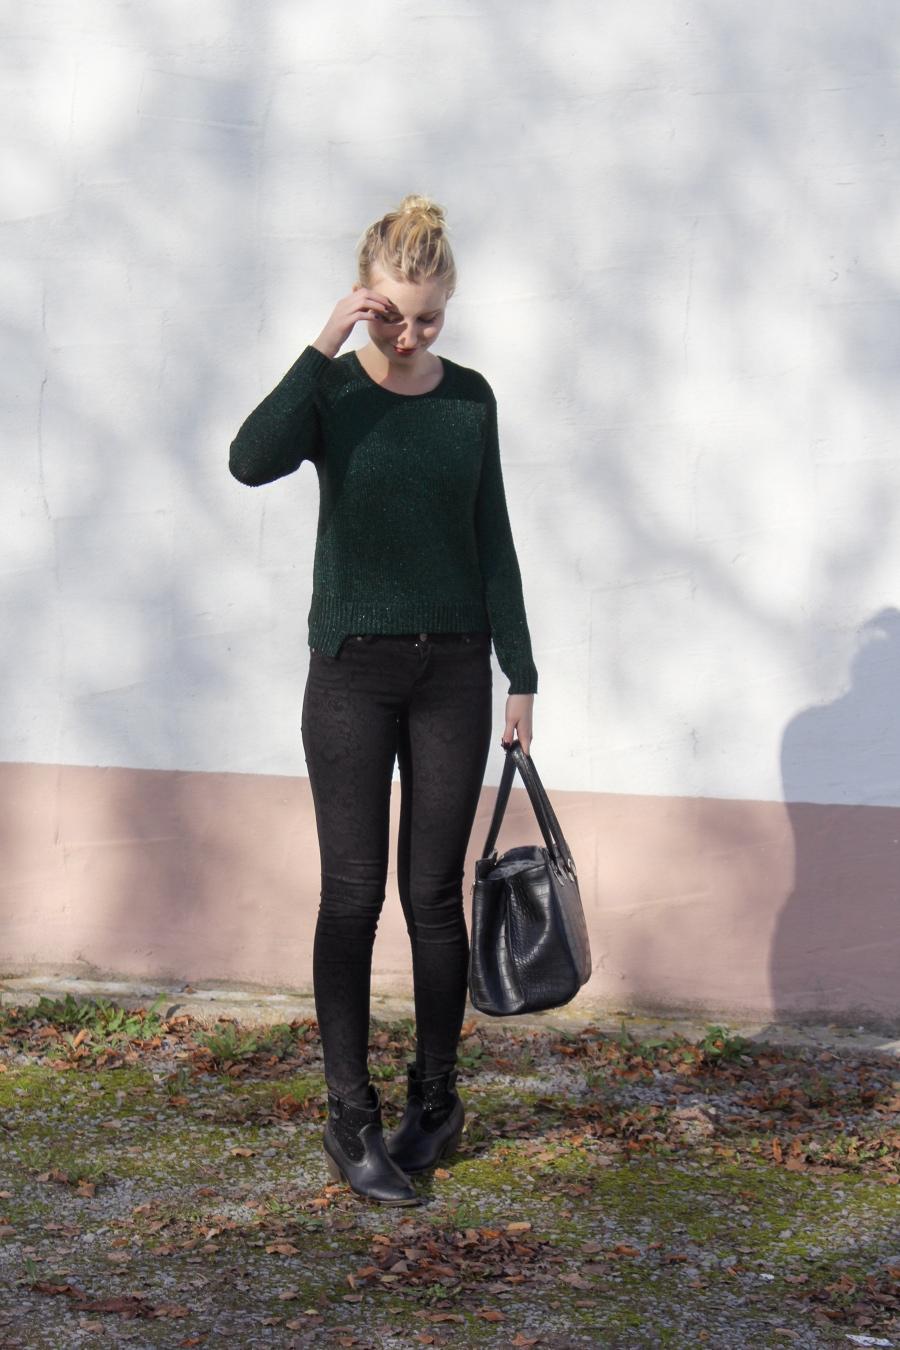 outfit-dark-hallhuber-bufallo-chic-highfashion